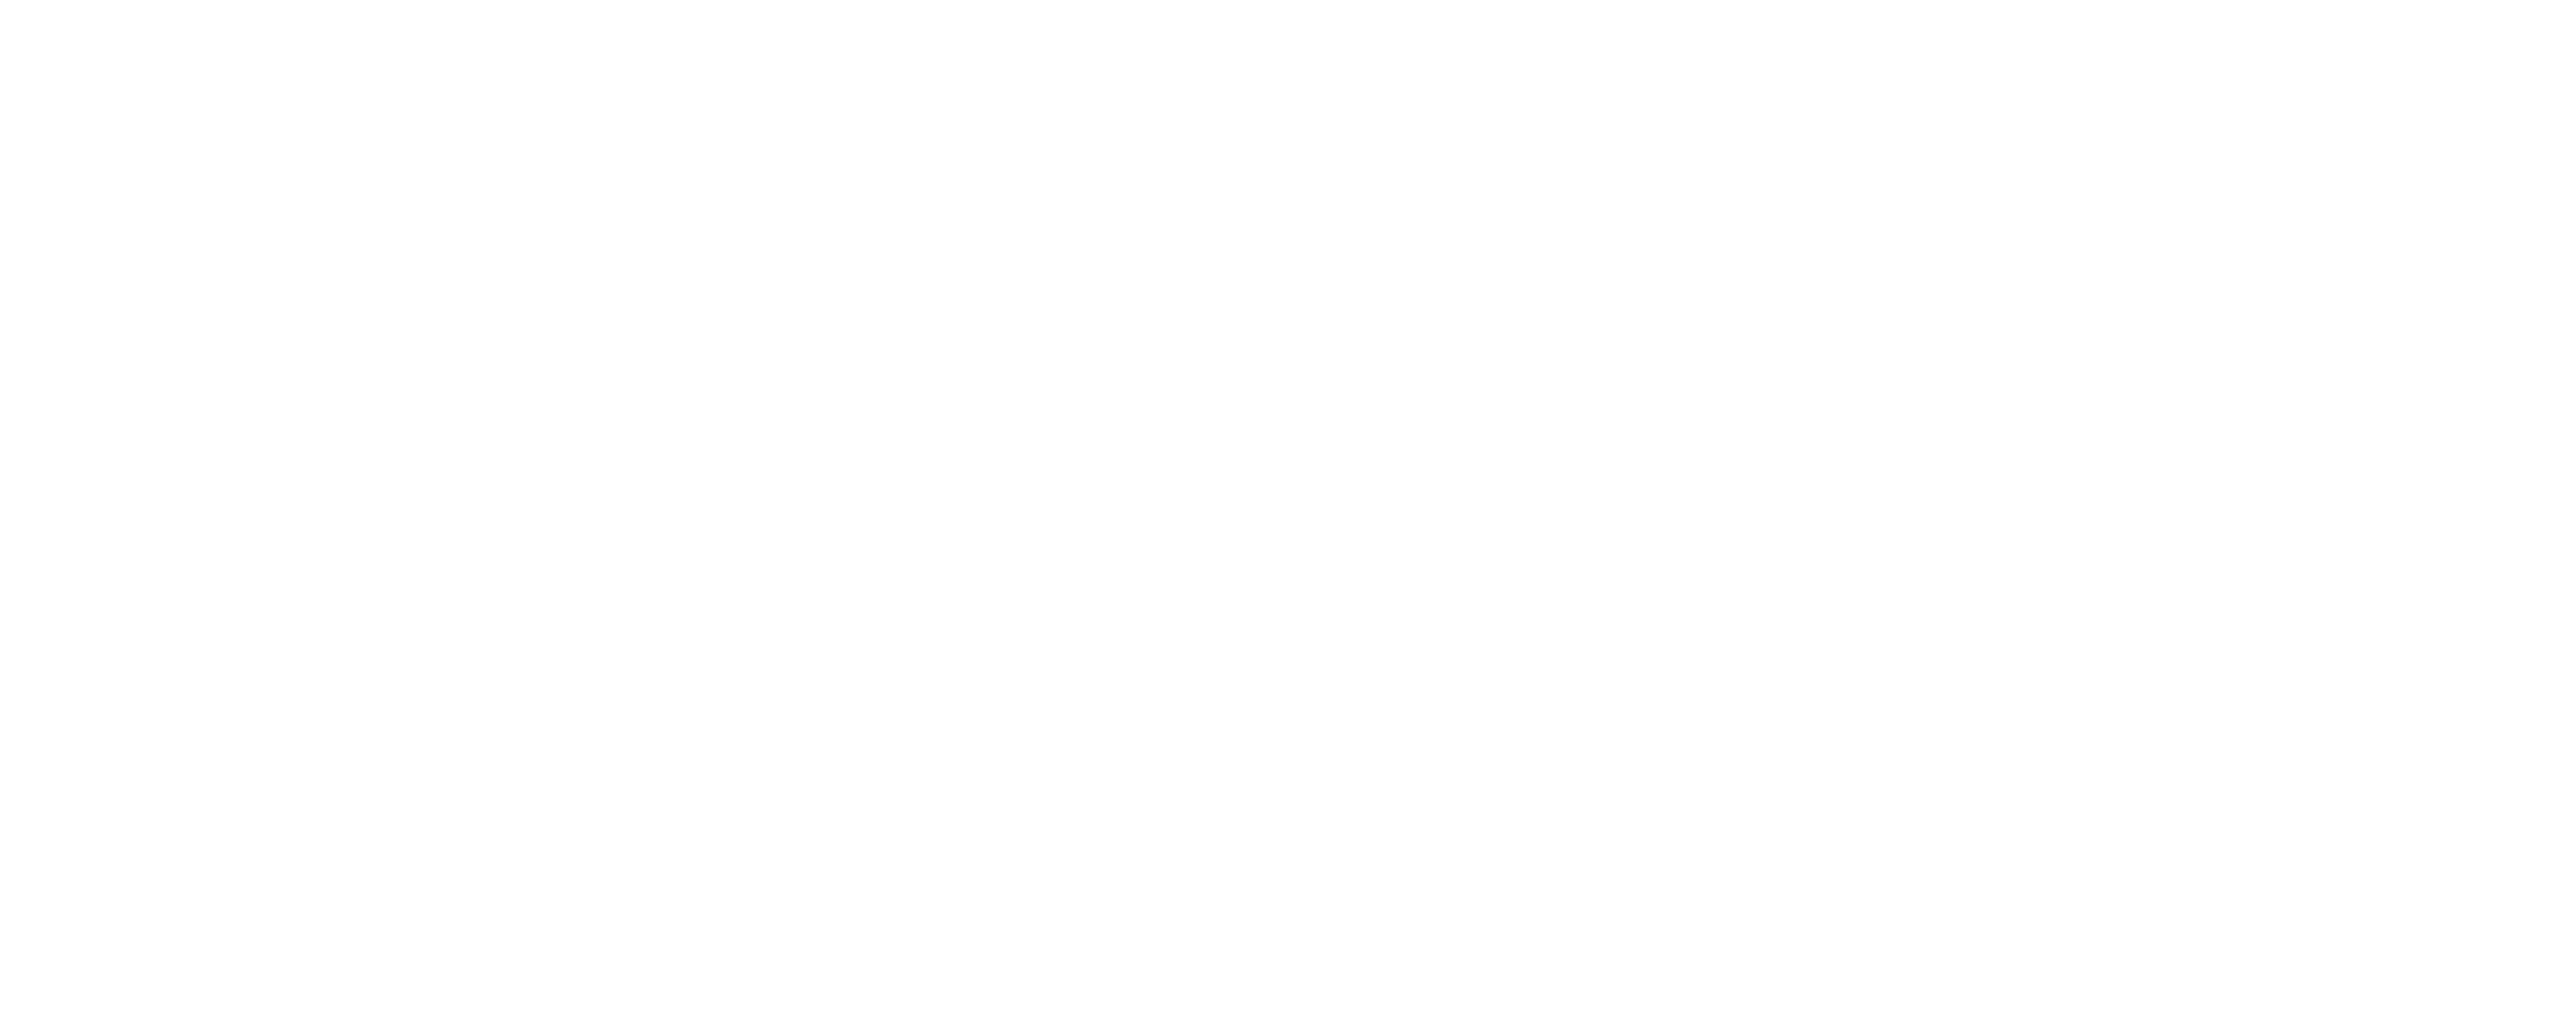 code-interior-text-02-01